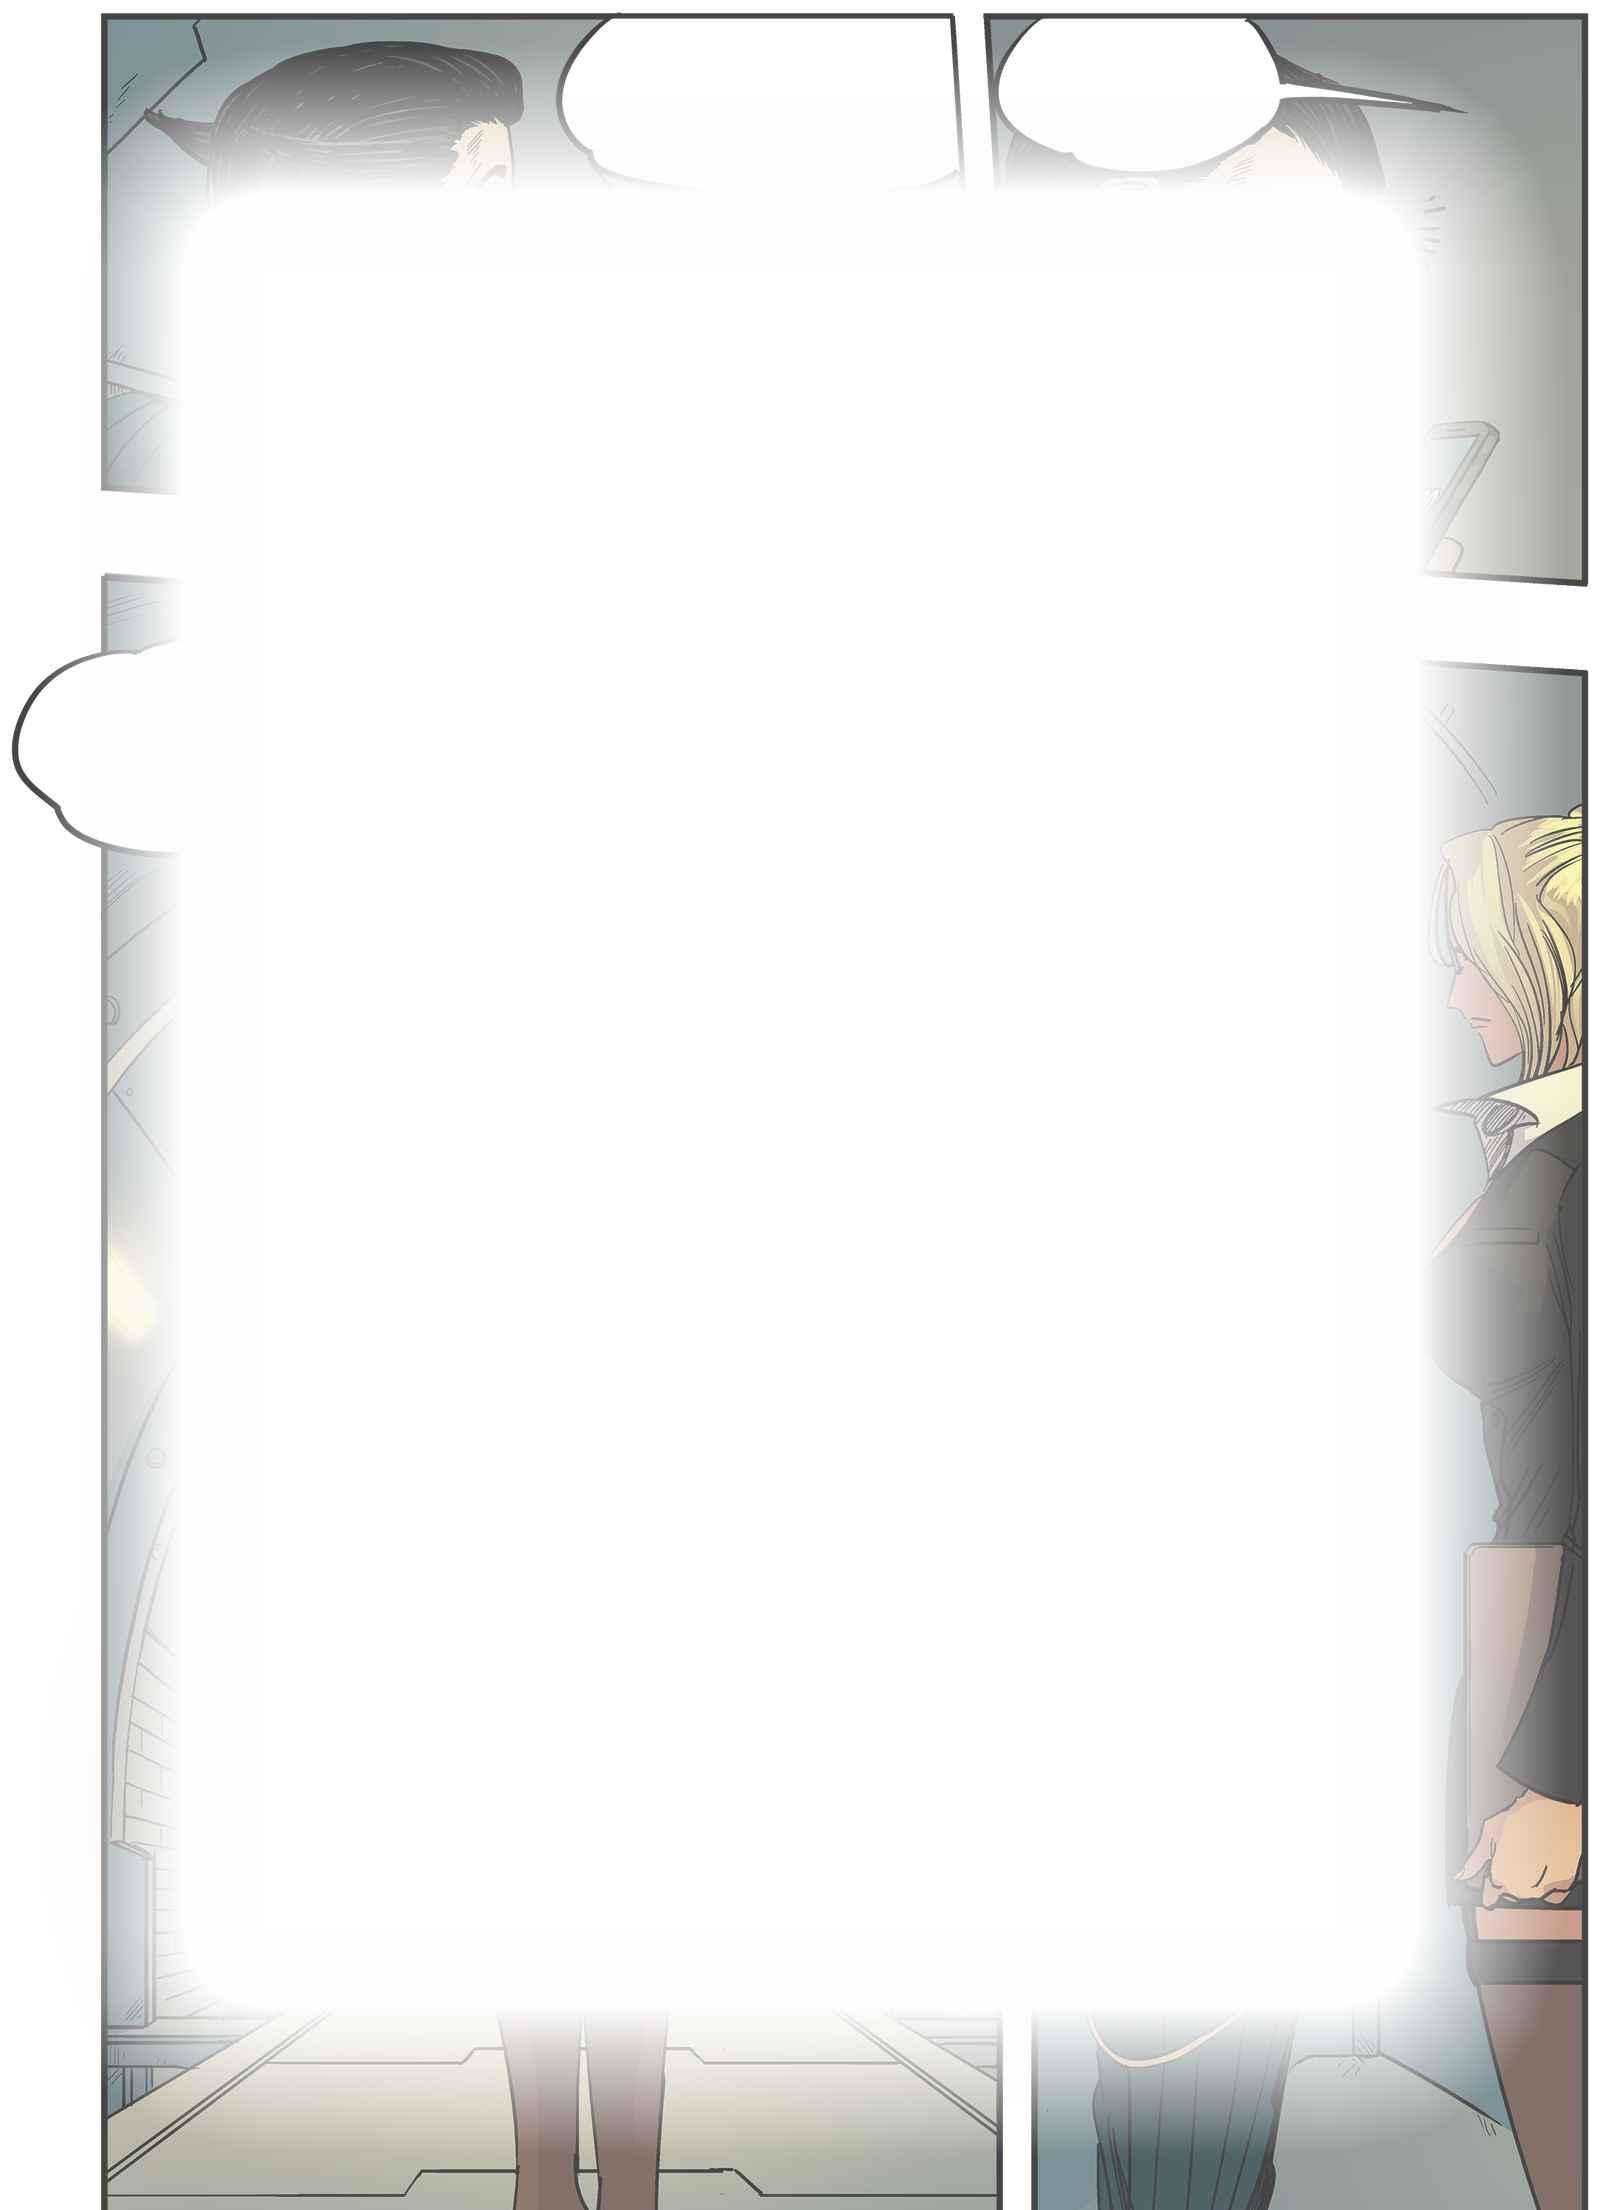 Amilova : チャプター 7 ページ 9